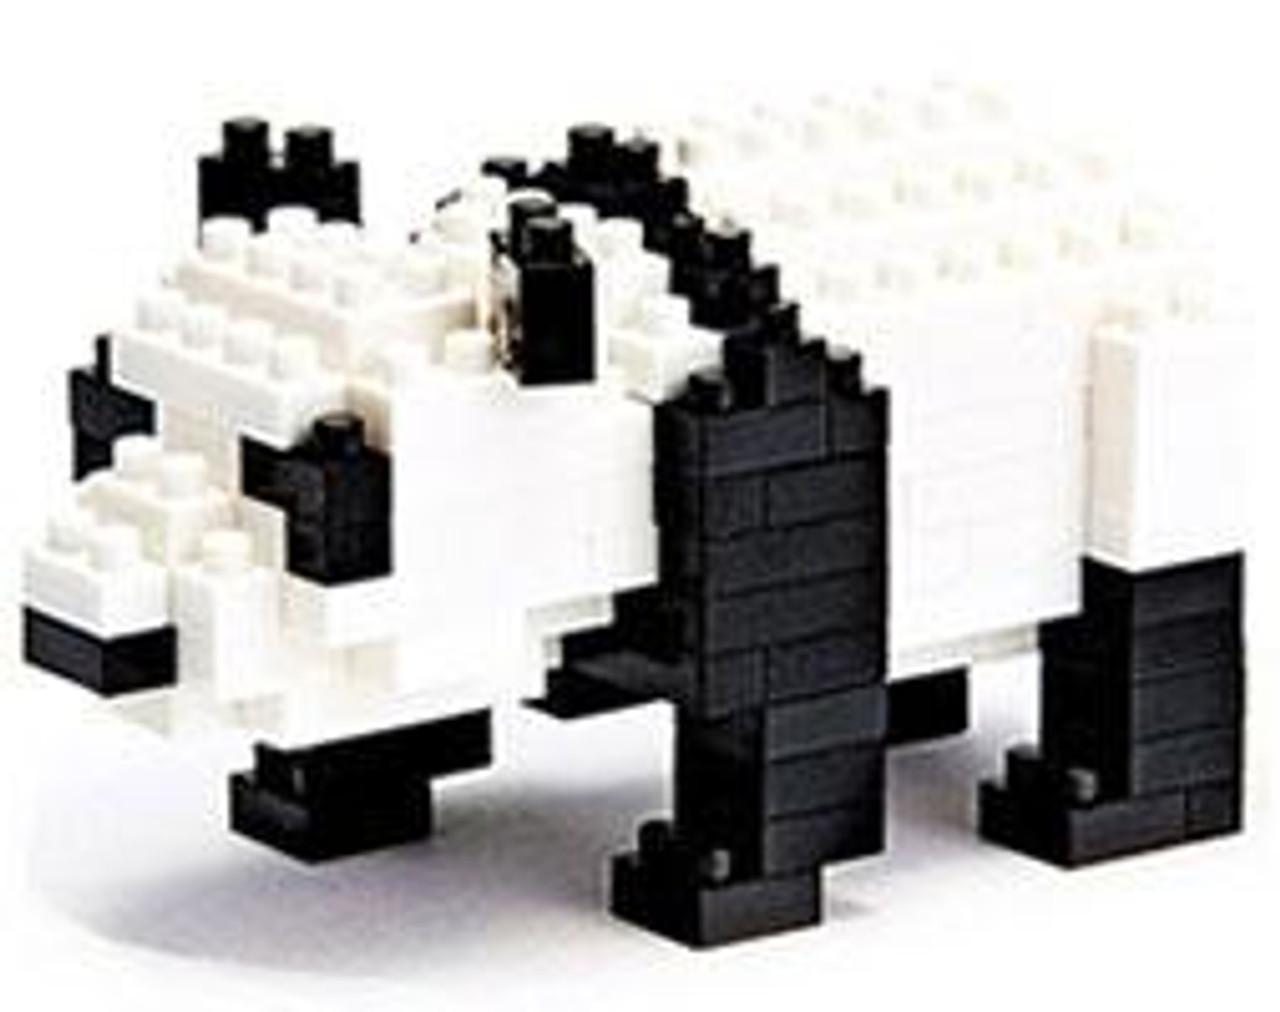 Nanoblock Micro-Sized Building Block Giant Panda Figure Set